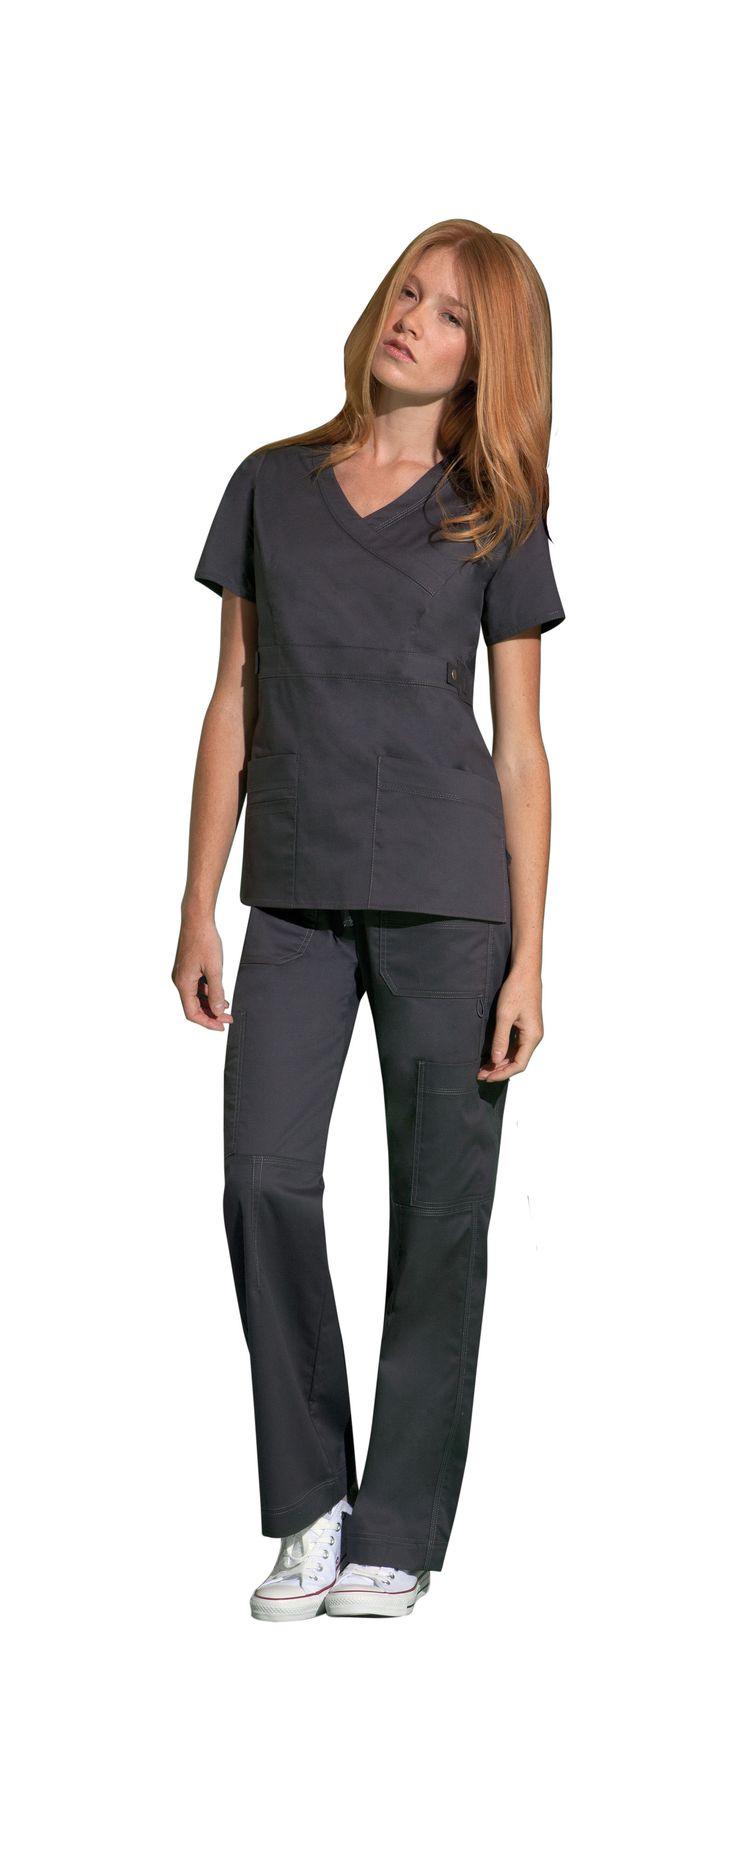 #dickies #scrubs #fall2013